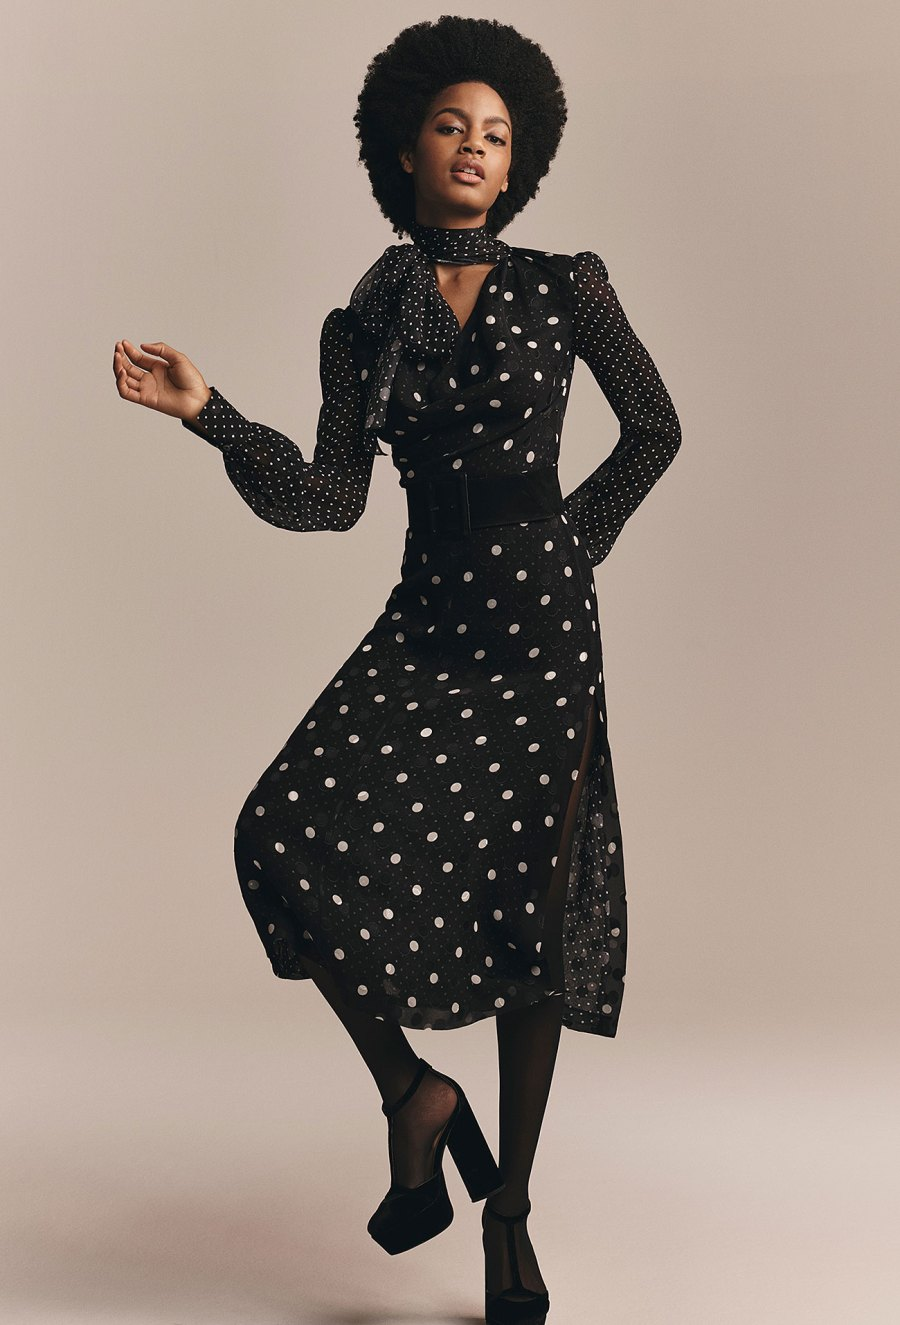 Zendaya x Tommy Hilfiger Collection - Zendaya Polka Dot Dress